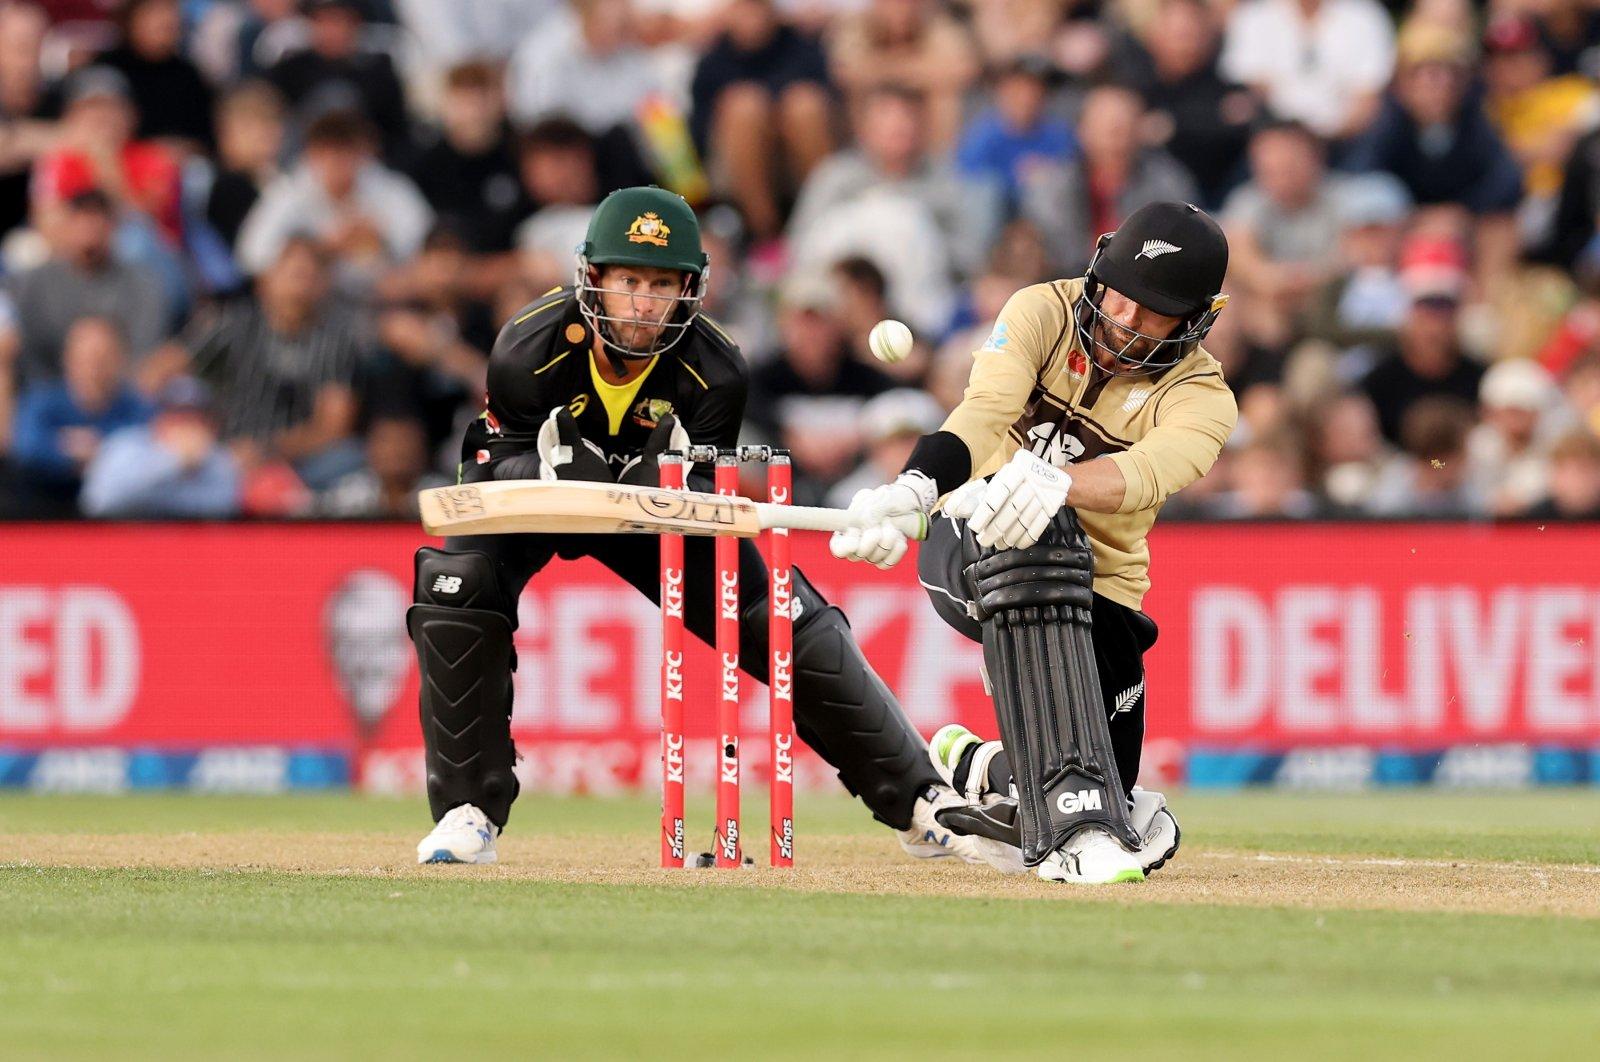 New Zealand's Devon Conway bats during the 1st T20 match against Australia at Hagley Park, Christchurch, New Zealand, Feb. 22, 2021. (EPA Photo)